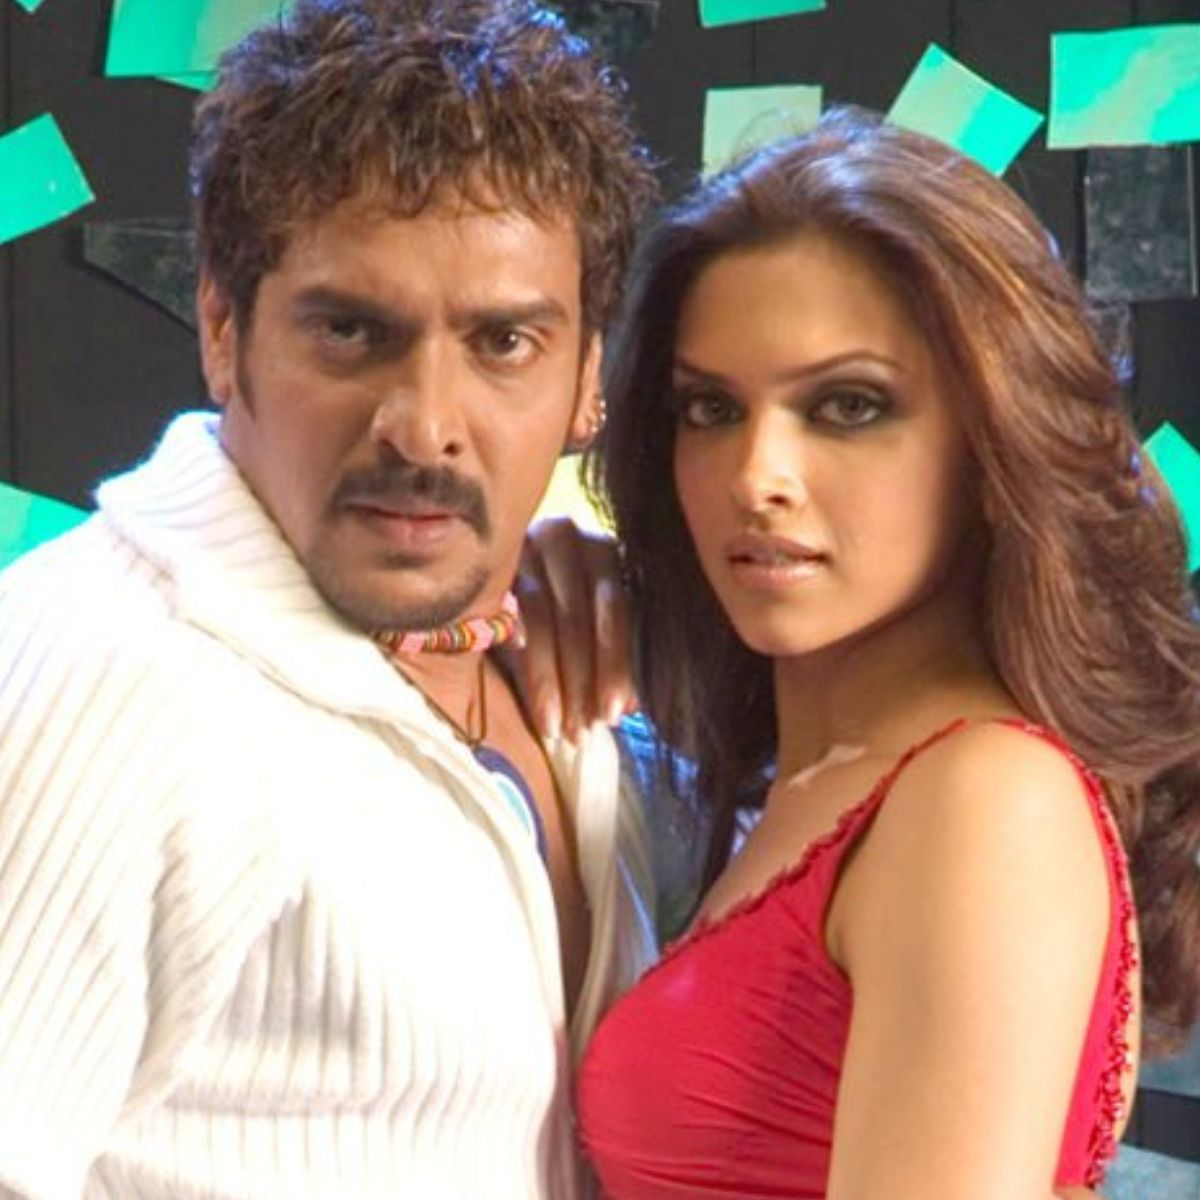 Did You Know Deepika Padukone Made Her Acting Debut With Kannada Film Aishwarya South Film Deepika Padukone Film